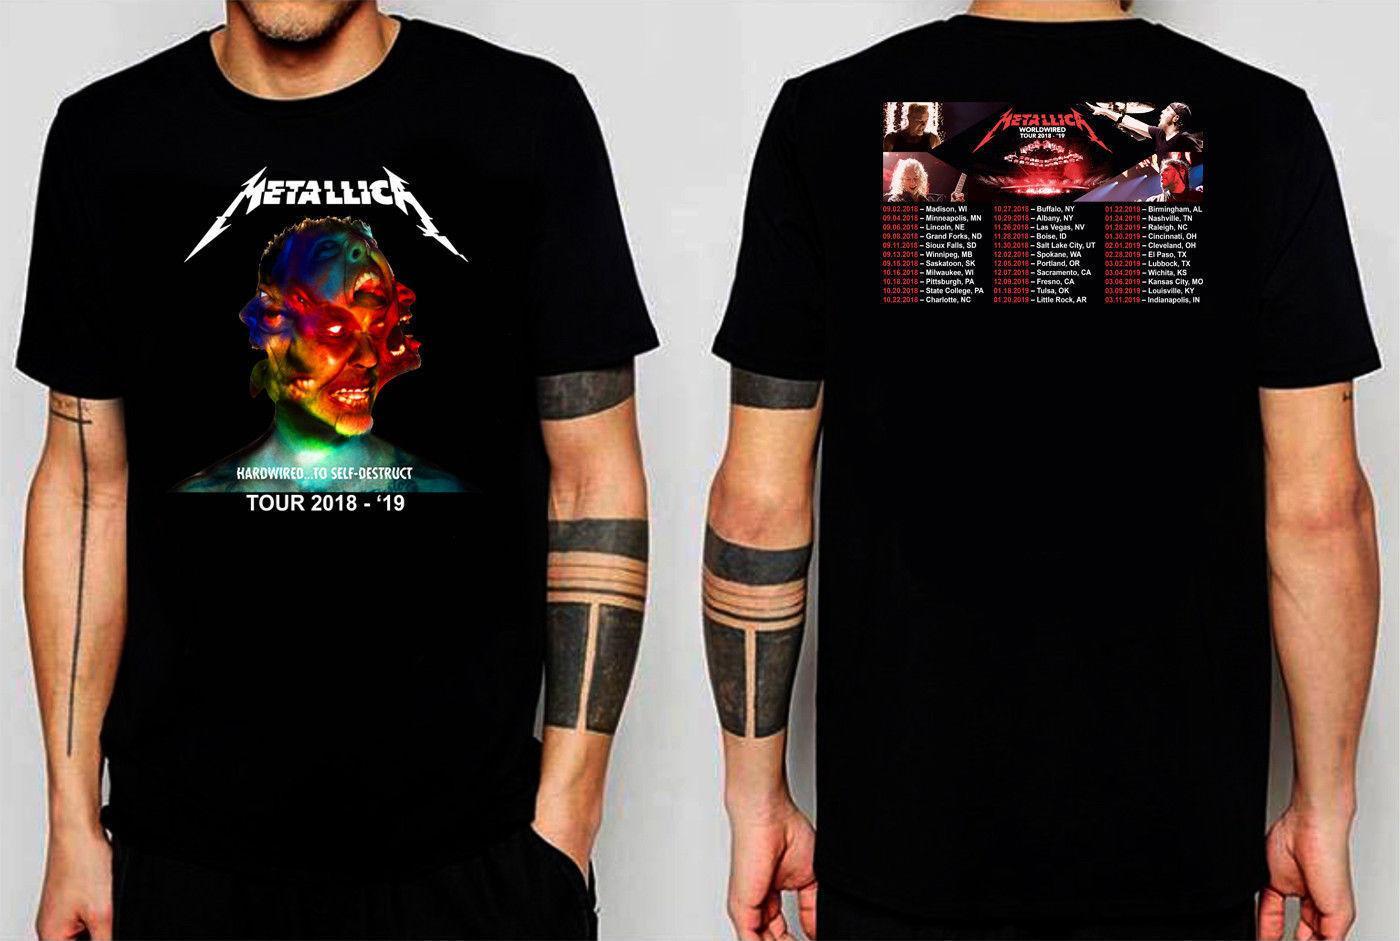 Compre PROMO AL POR MAYOR TOUR WorldWired 2018 2019 Camiseta Talla L A 4XL  Alta Calidad Hombres Camisetas 2018 Nuevos Hombres Manga Corta Argentina A   11.01 ... ecee7a9de3280